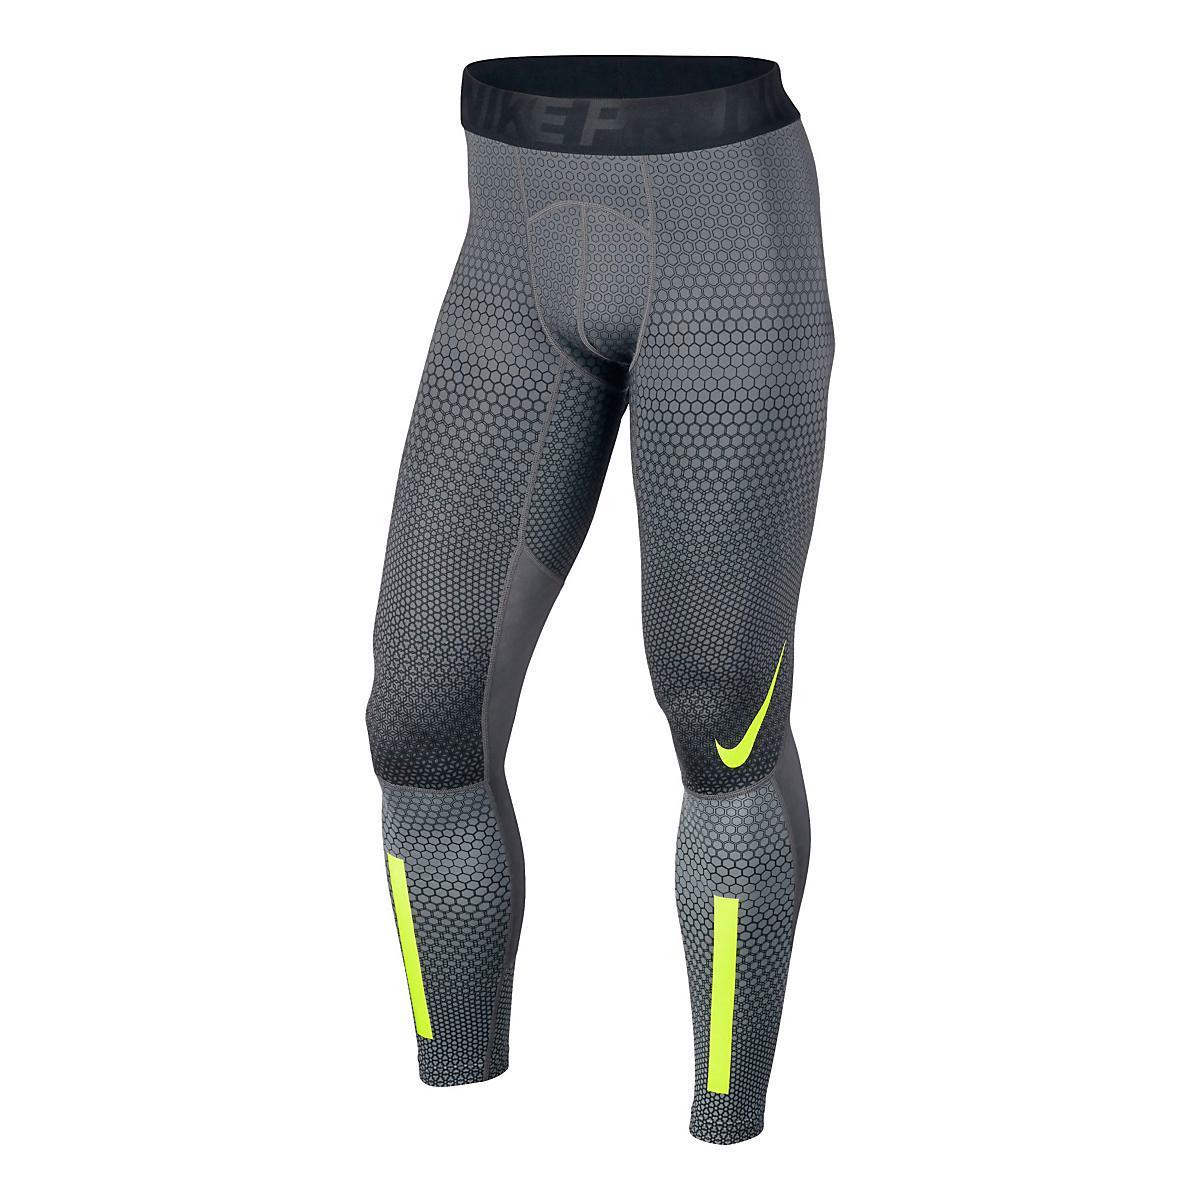 d21c614ddb6b6 Mens Nike Pro Hyperwarm Hexodrome Tights & Leggings at Road Runner Sports